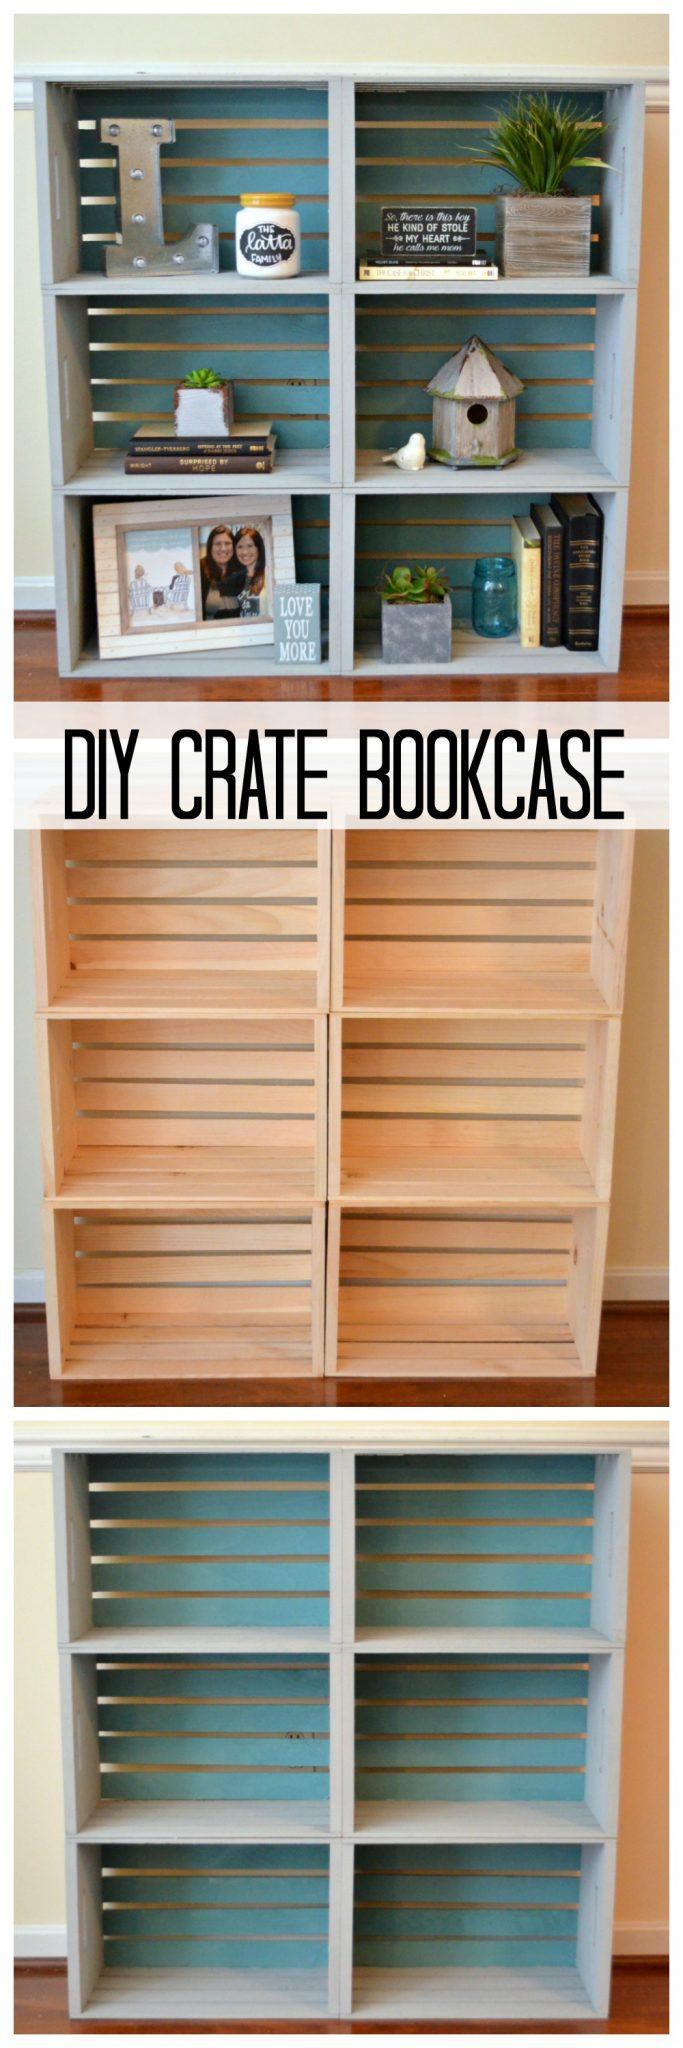 Diy crate bookcase amy latta creations diy crate bookcase solutioingenieria Choice Image